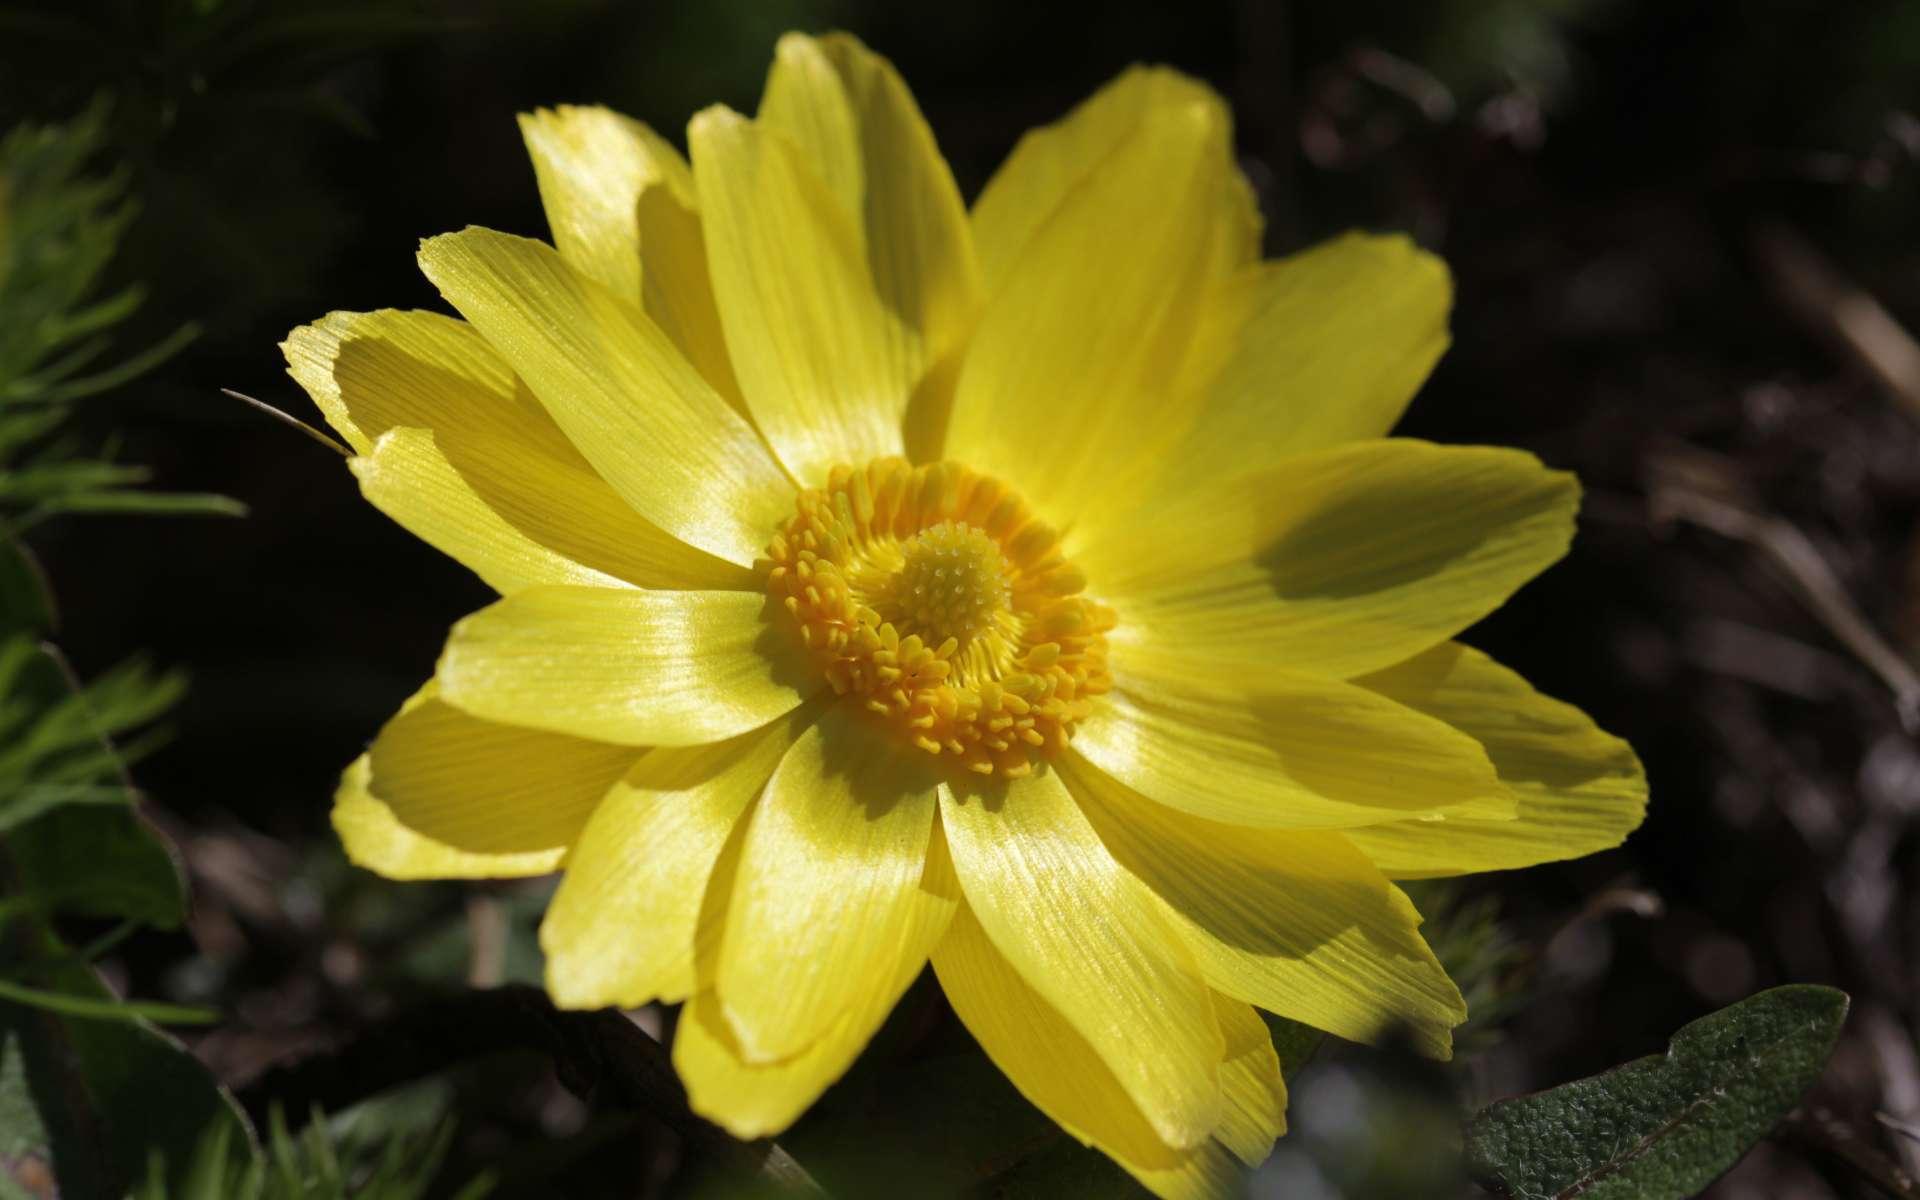 Adonis de printemps (Crédits : Bjorn S - Flickr)